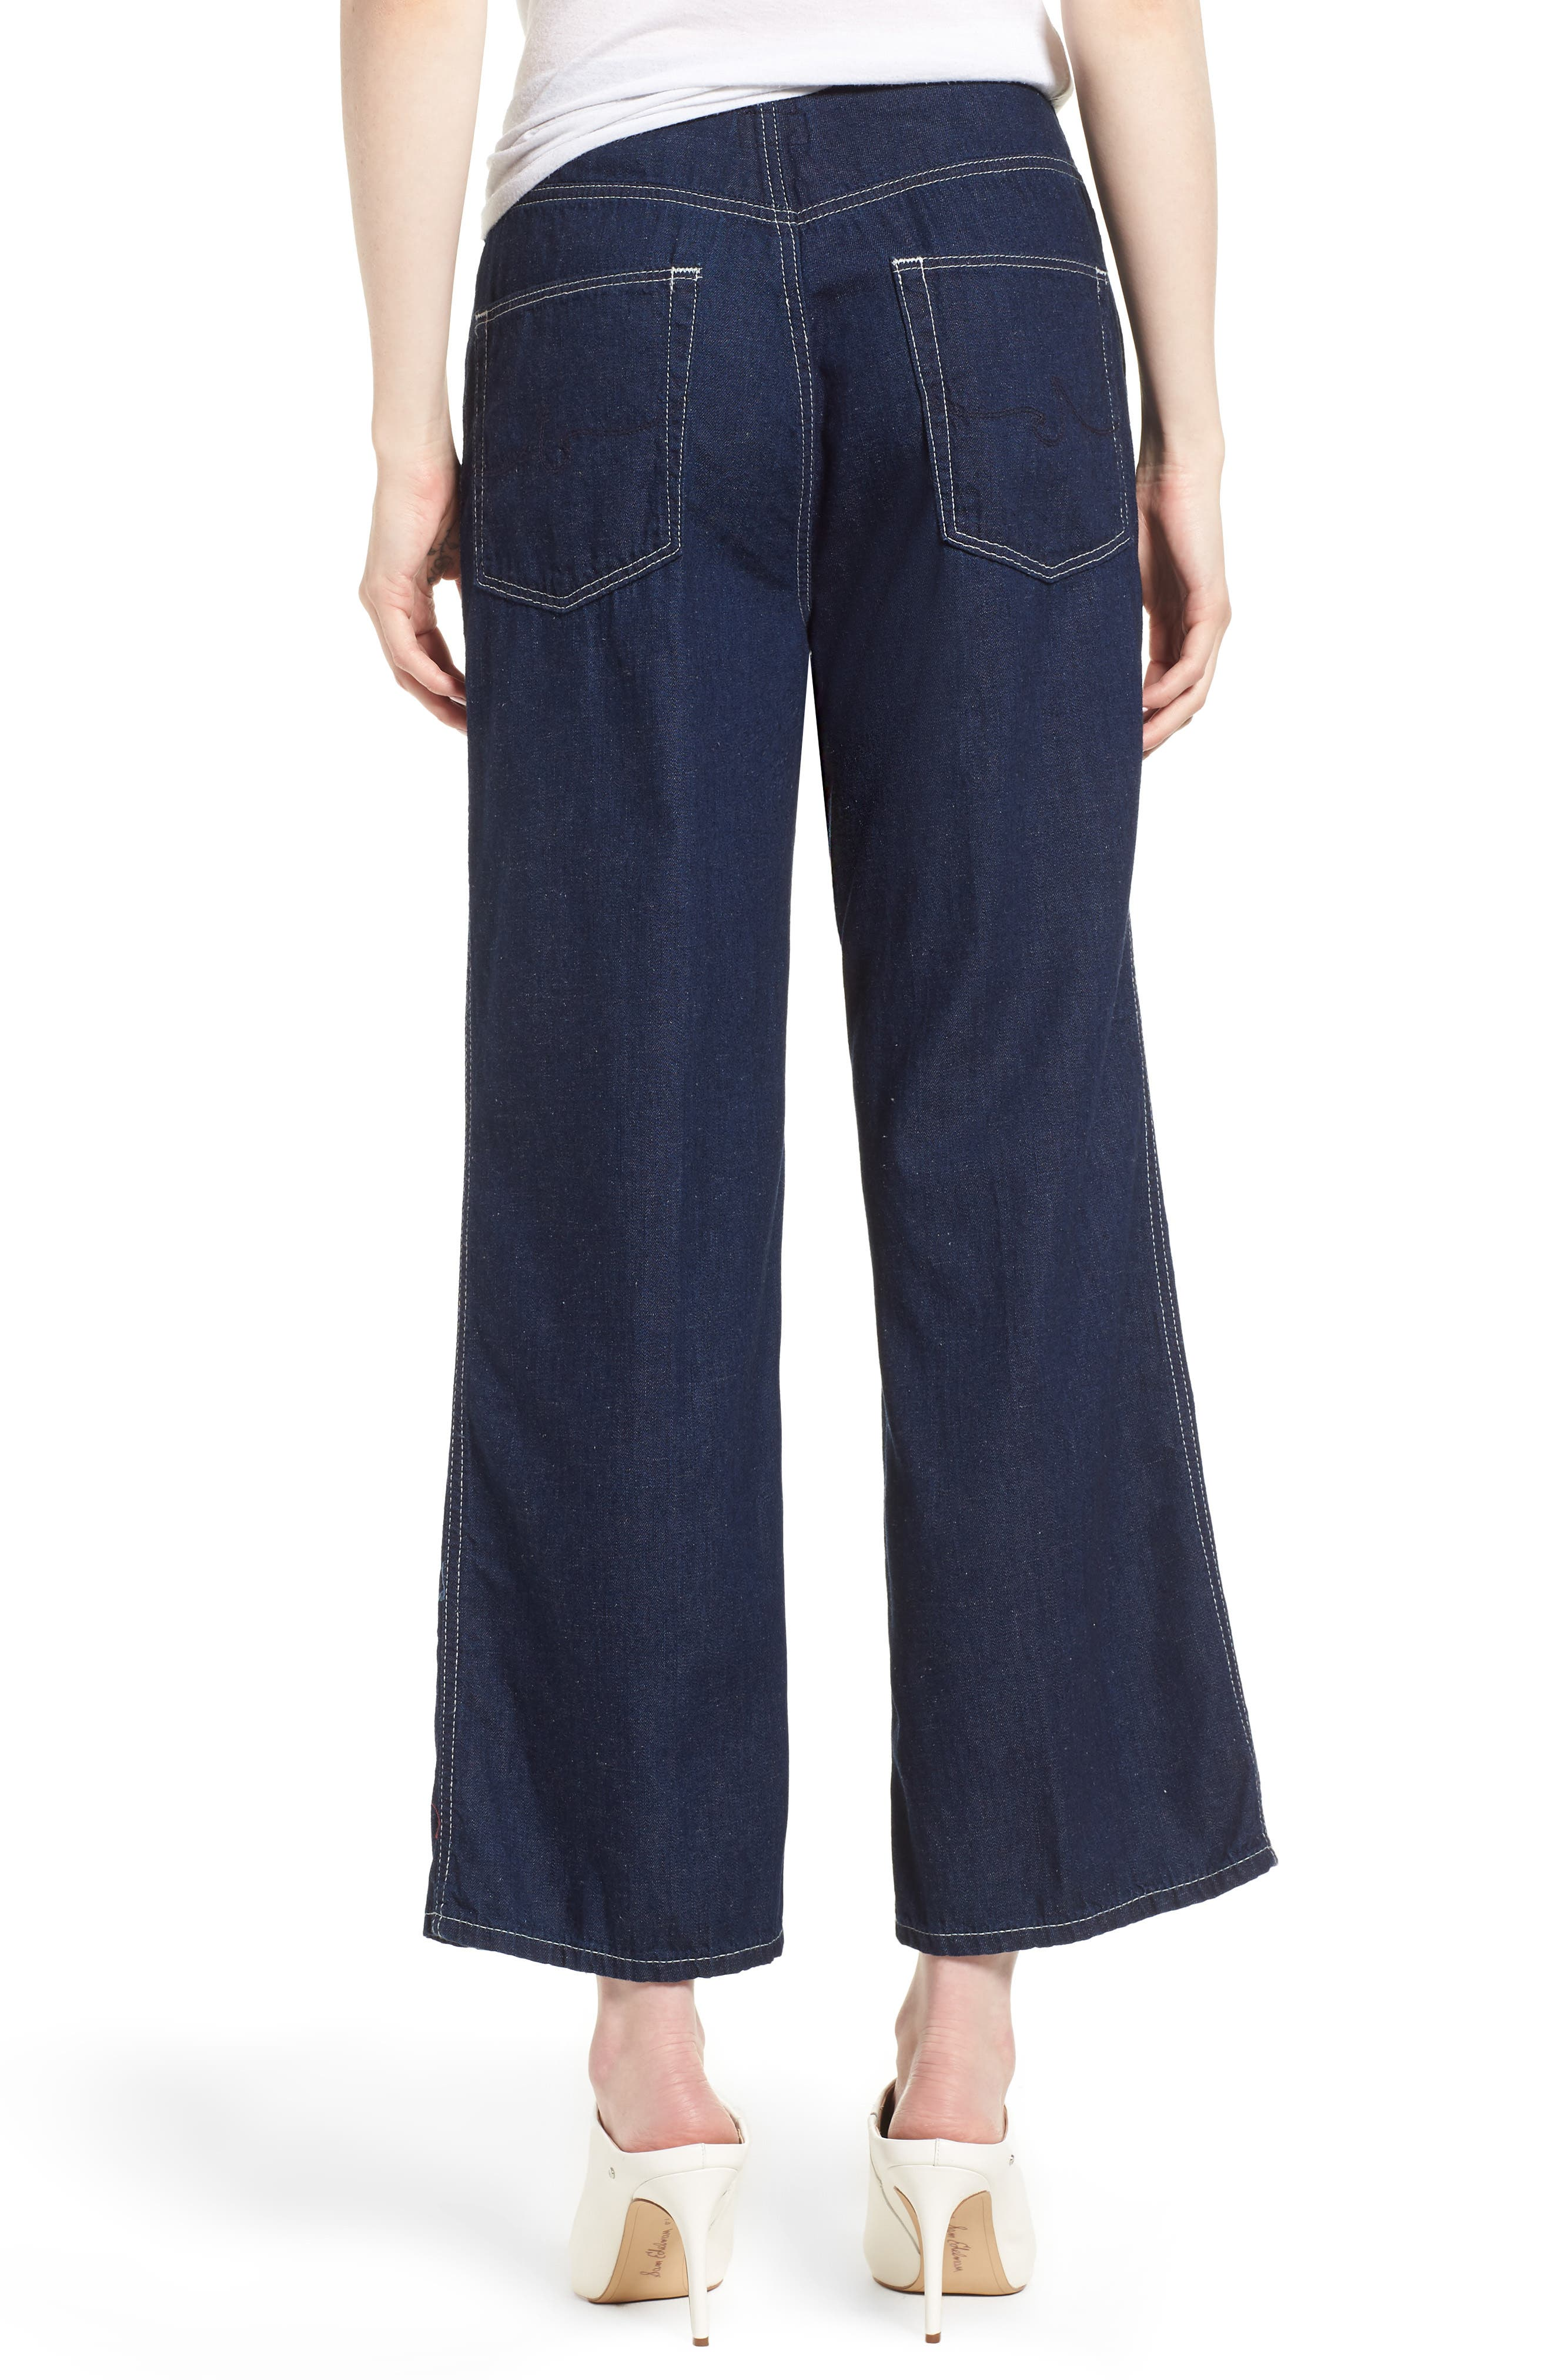 Etta High Waist Crop Wide Leg Jeans,                             Alternate thumbnail 2, color,                             Midnight Surge